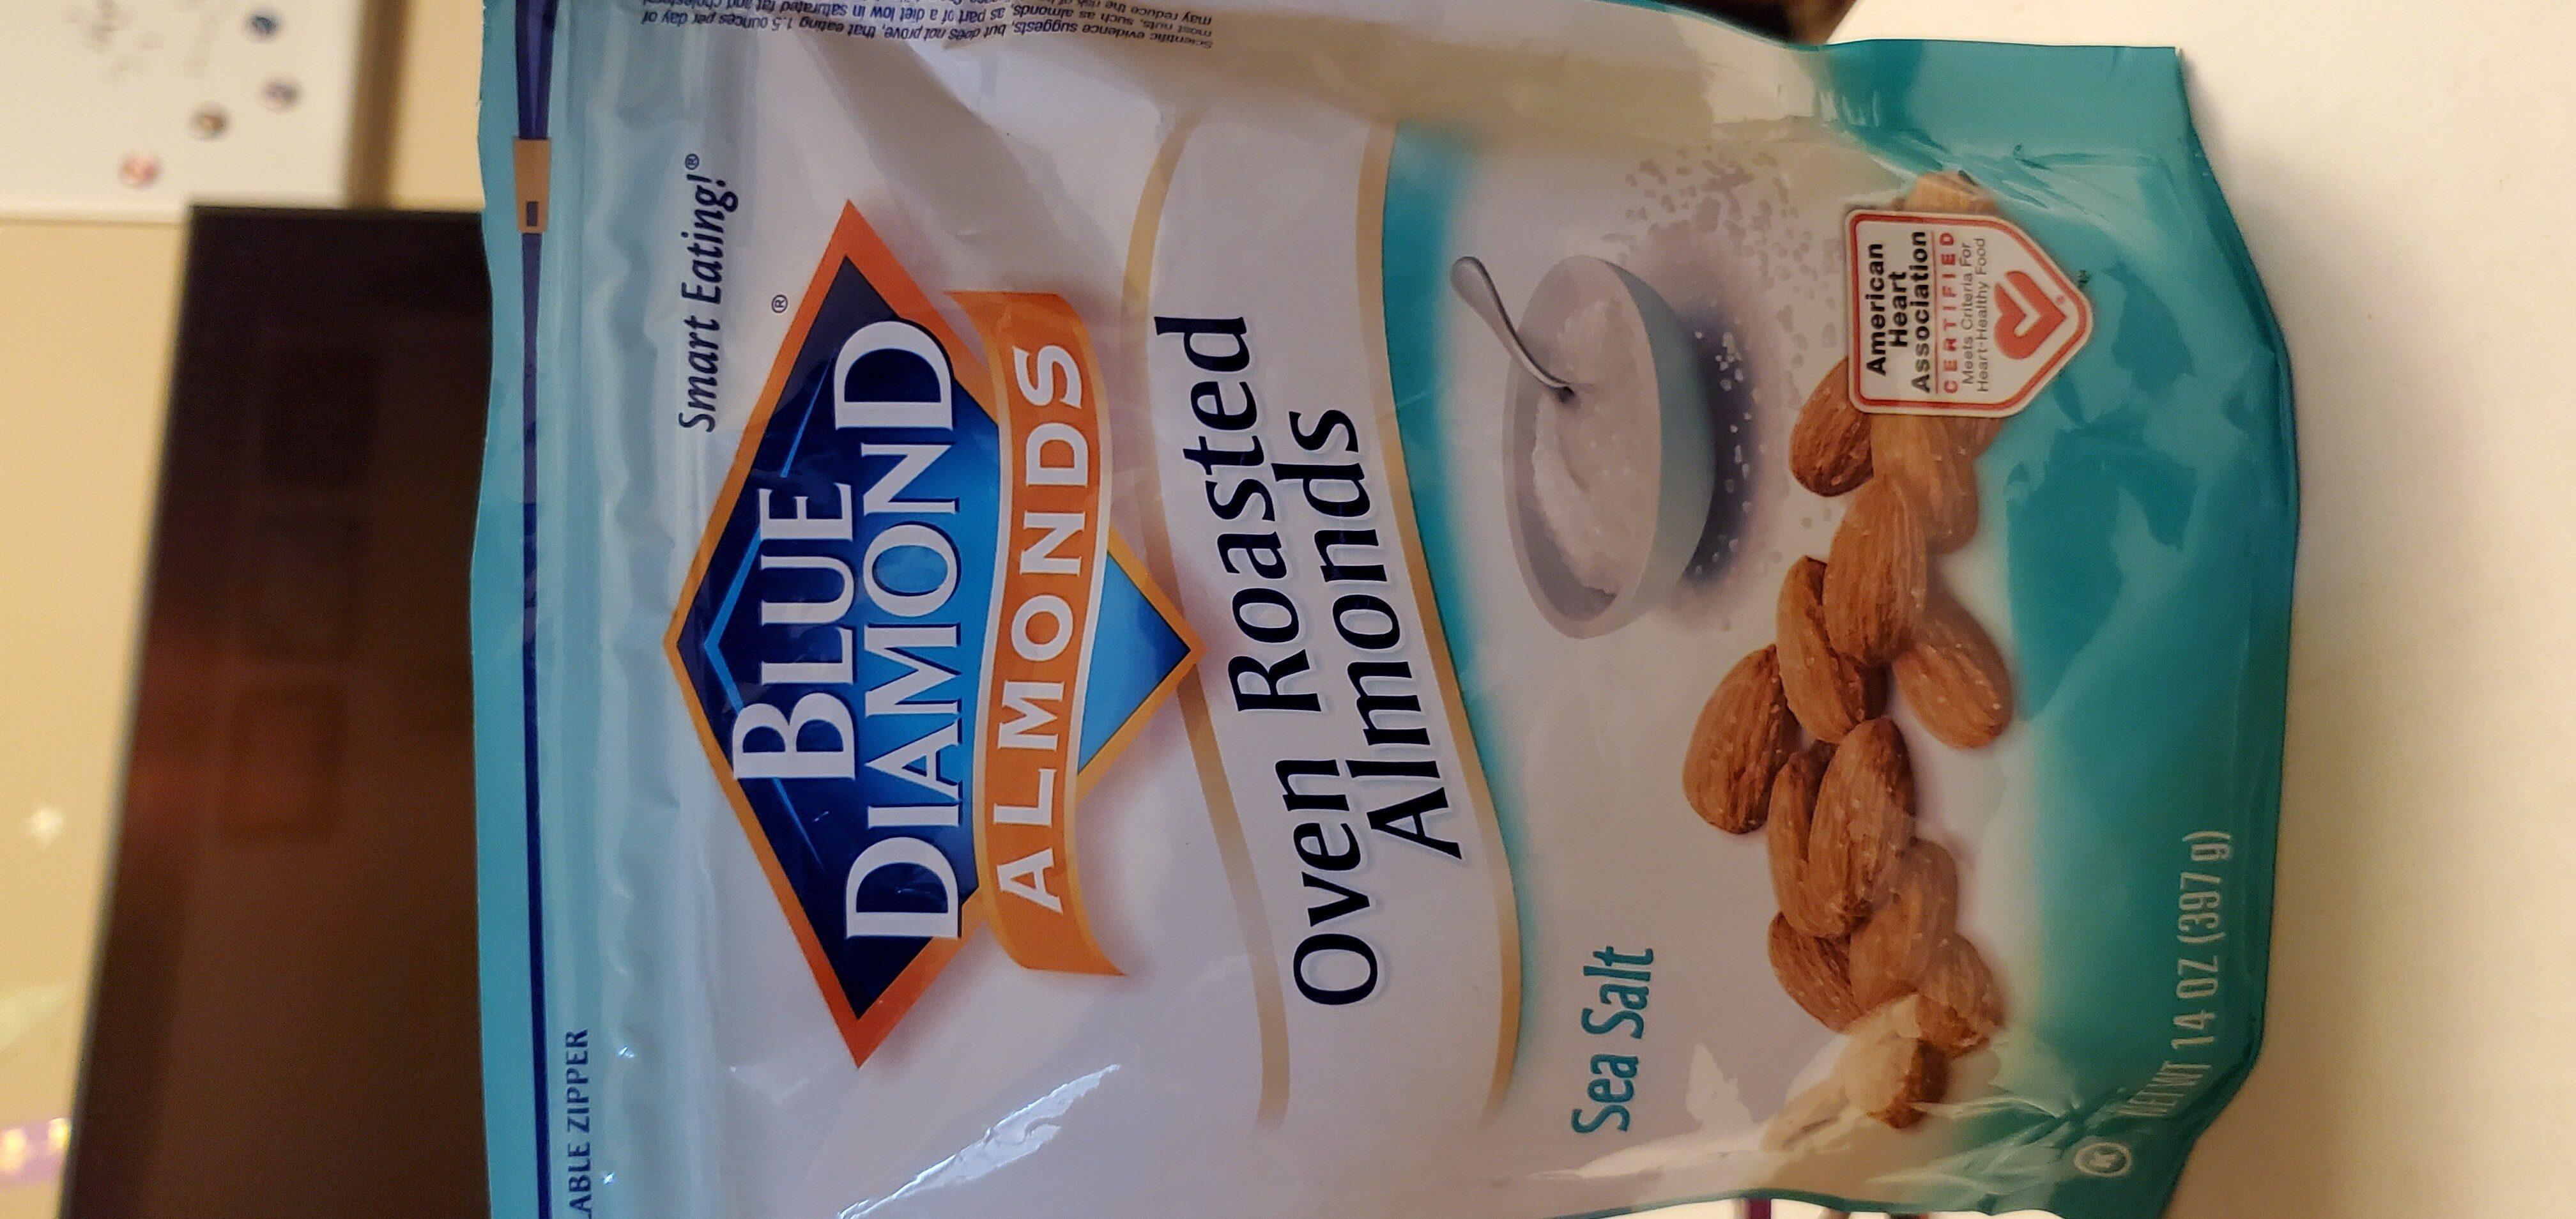 Oven roasted almonds, sea salt - Produit - en